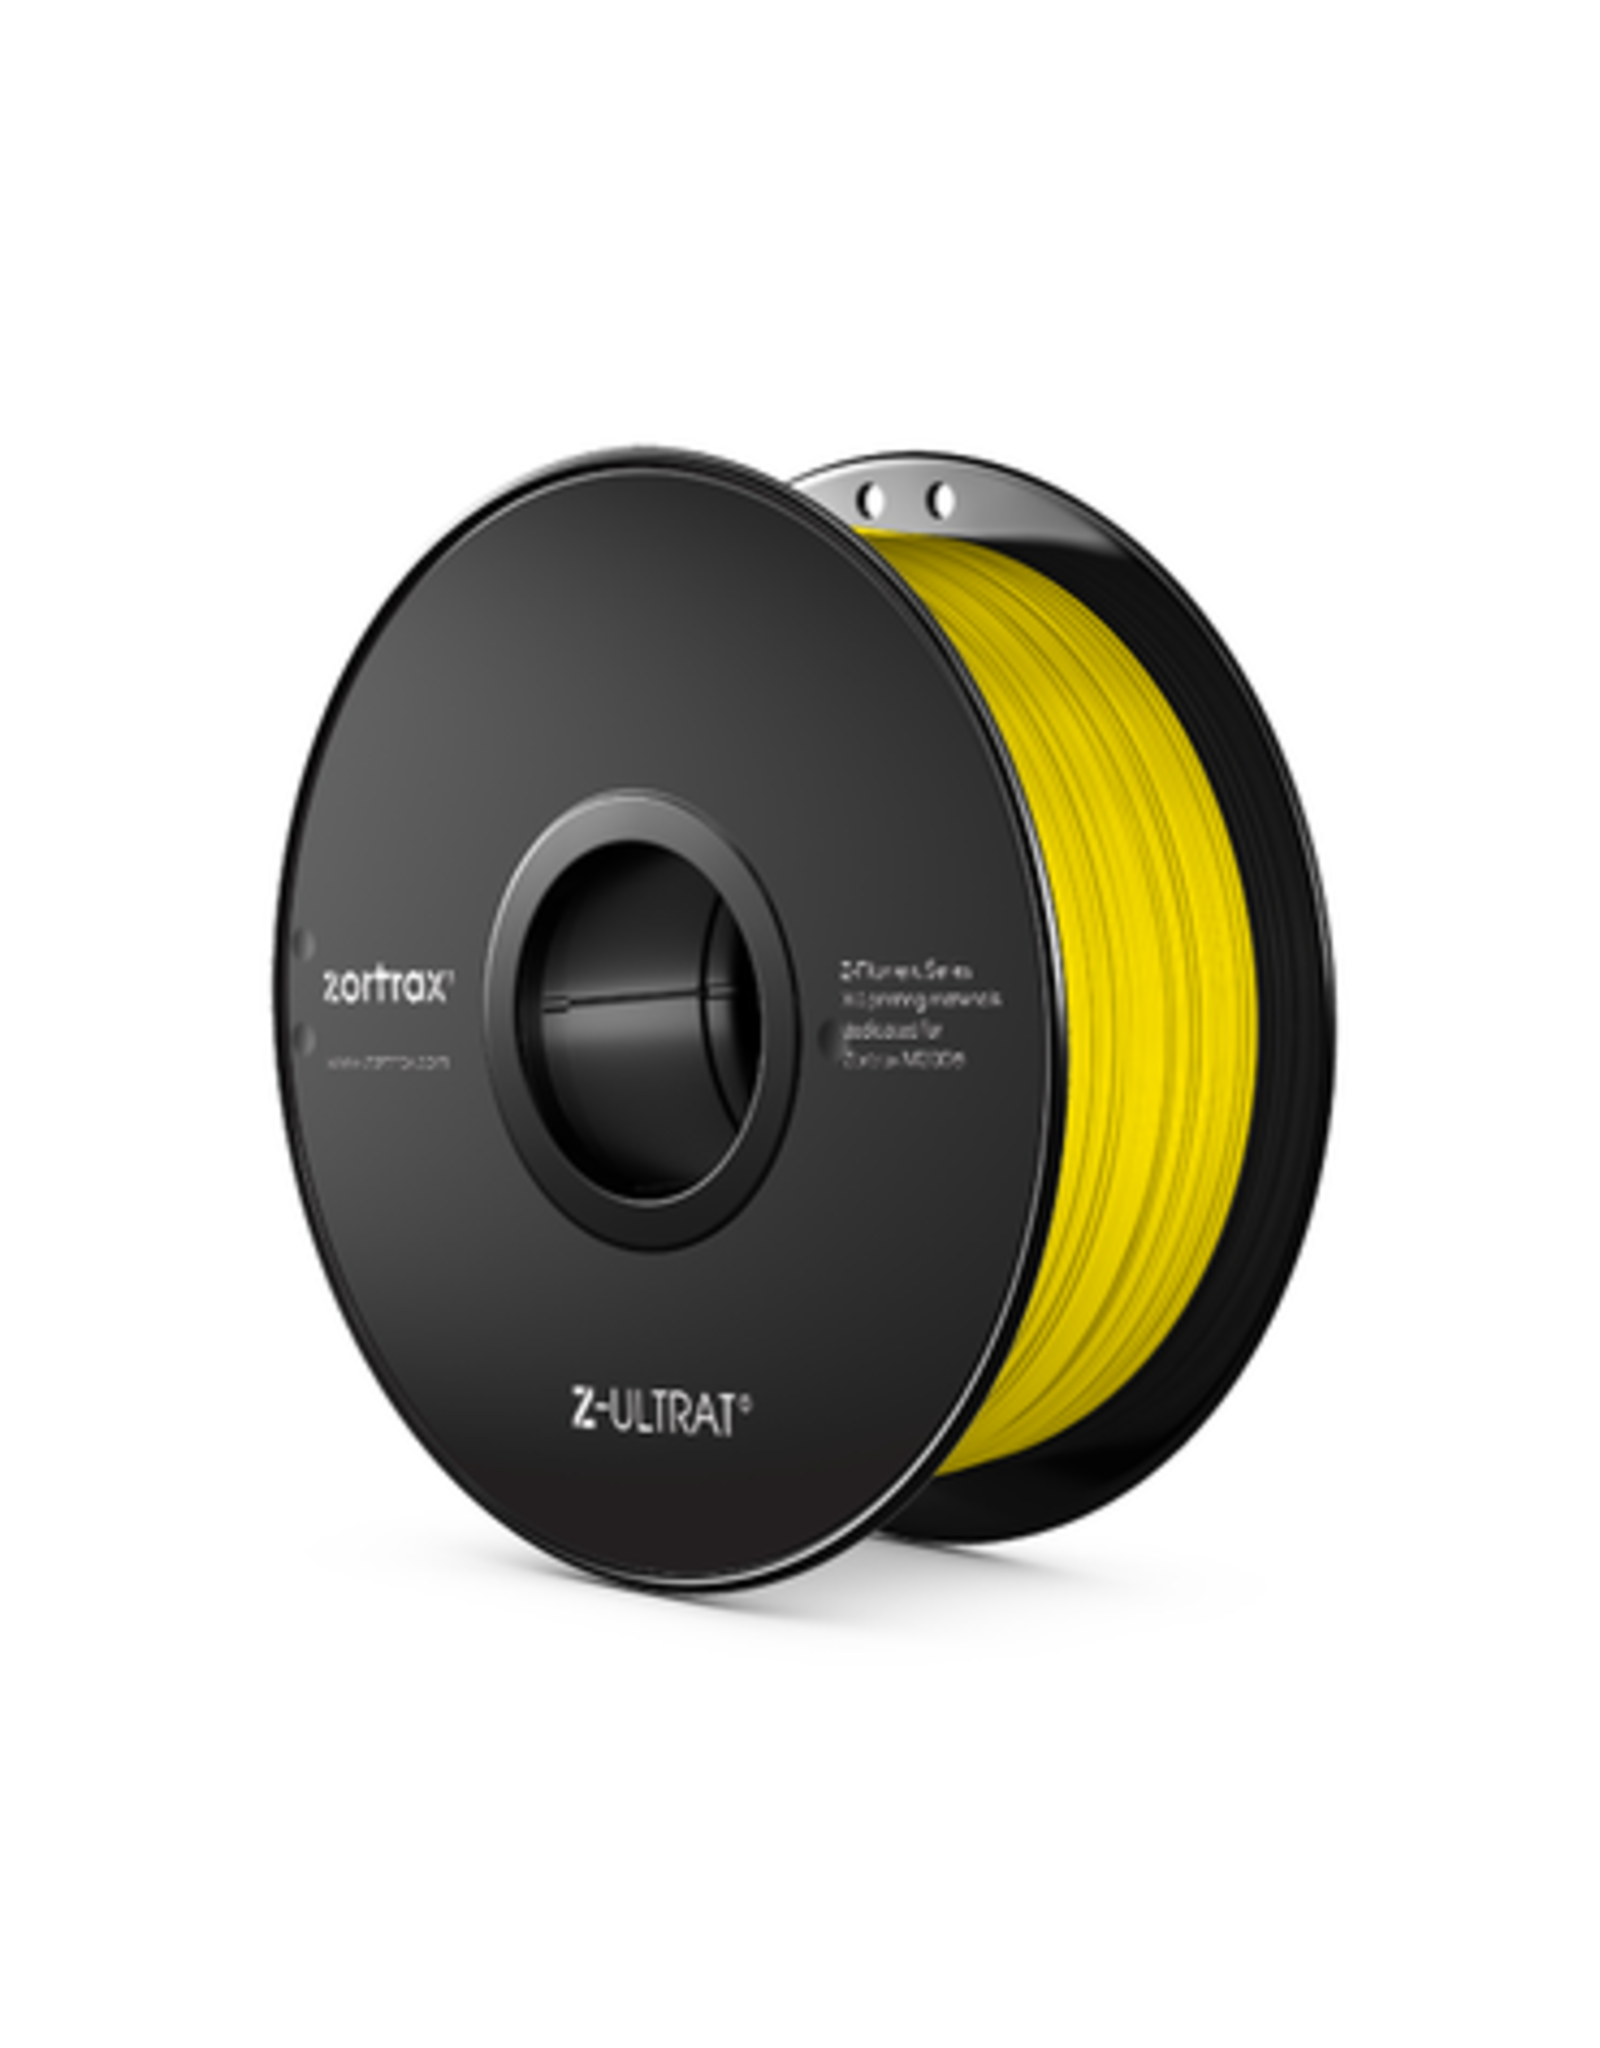 Zortrax Z-ULTRAT Filament - 1.75mm - 800g - Geel